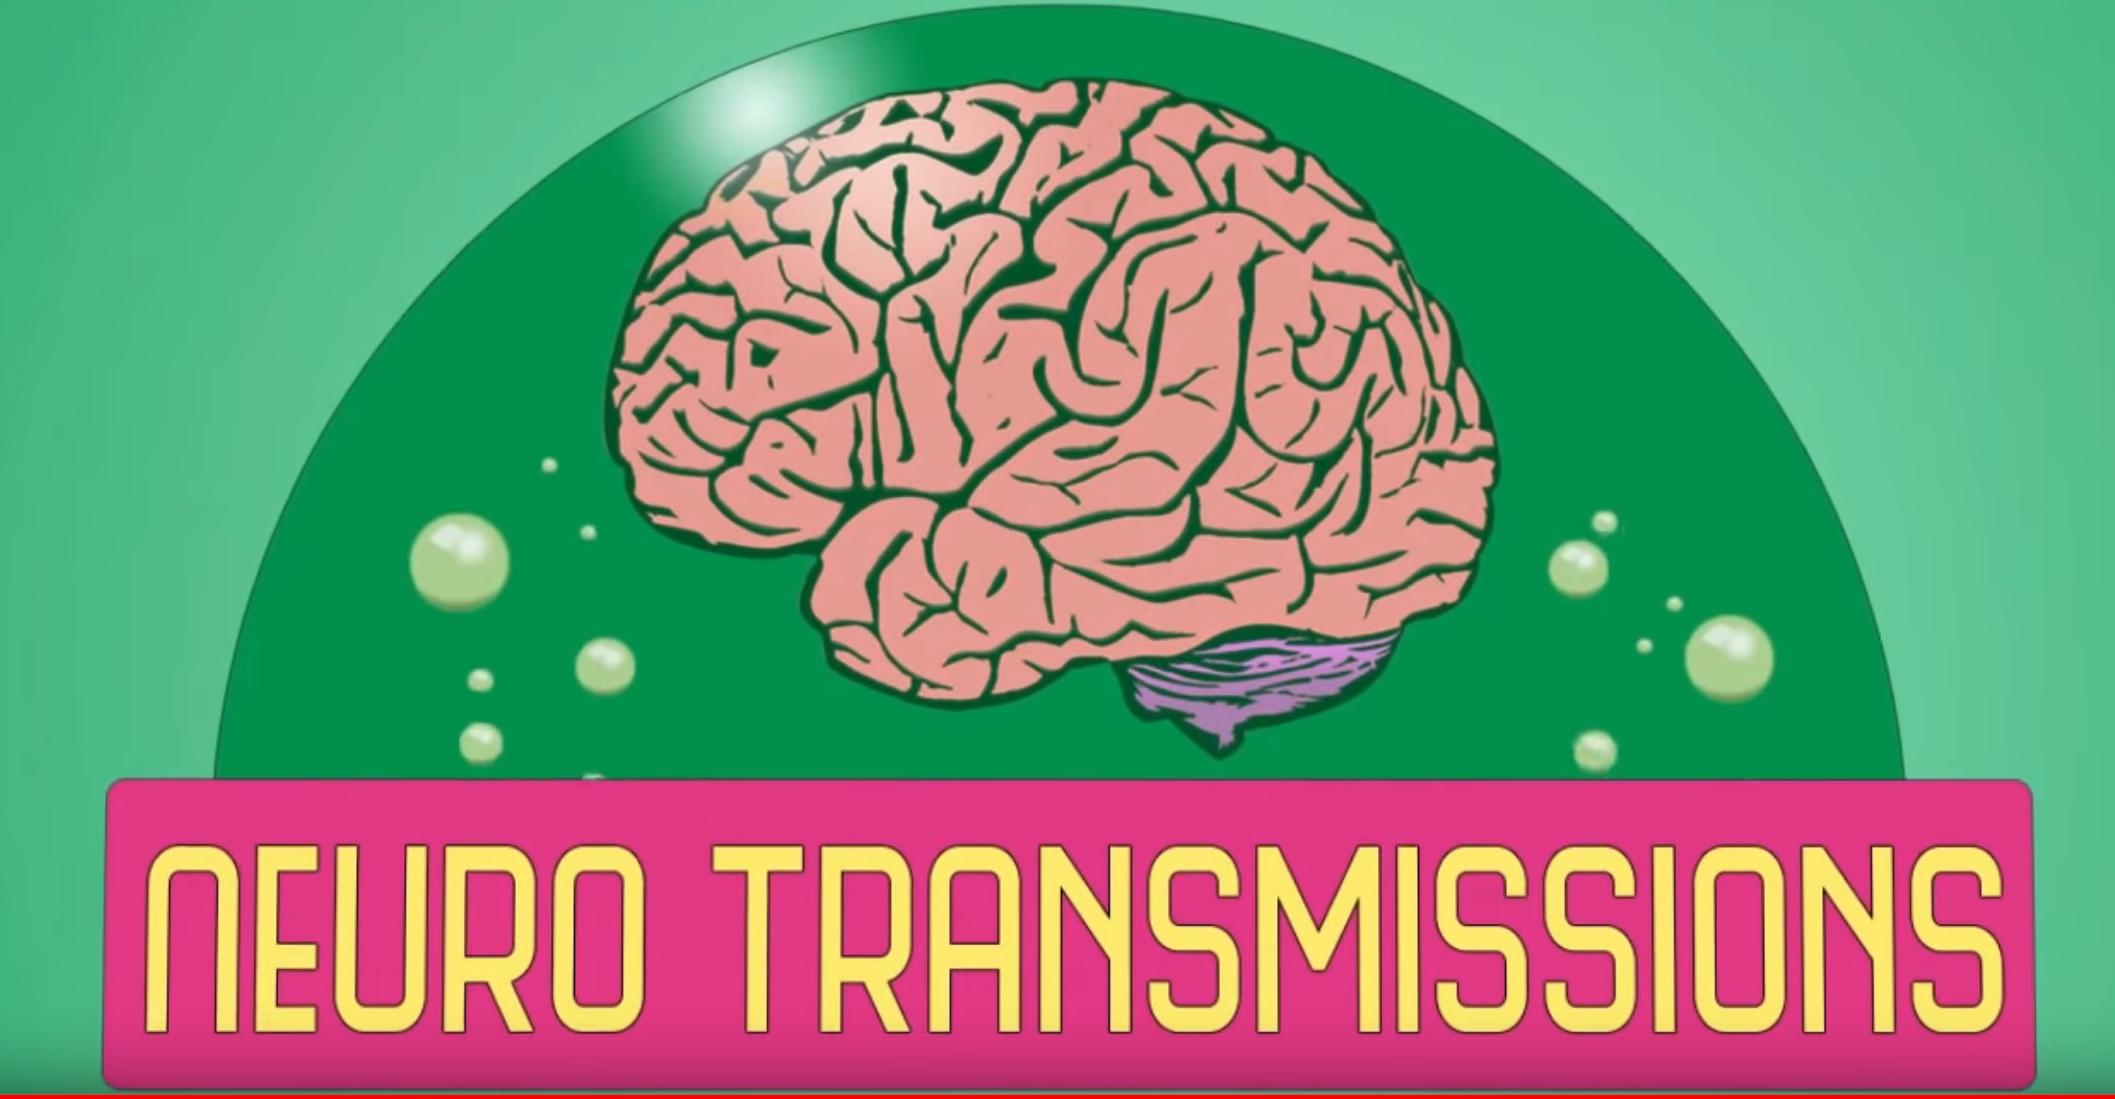 Core Concepts Resources | The British Neuroscience Association